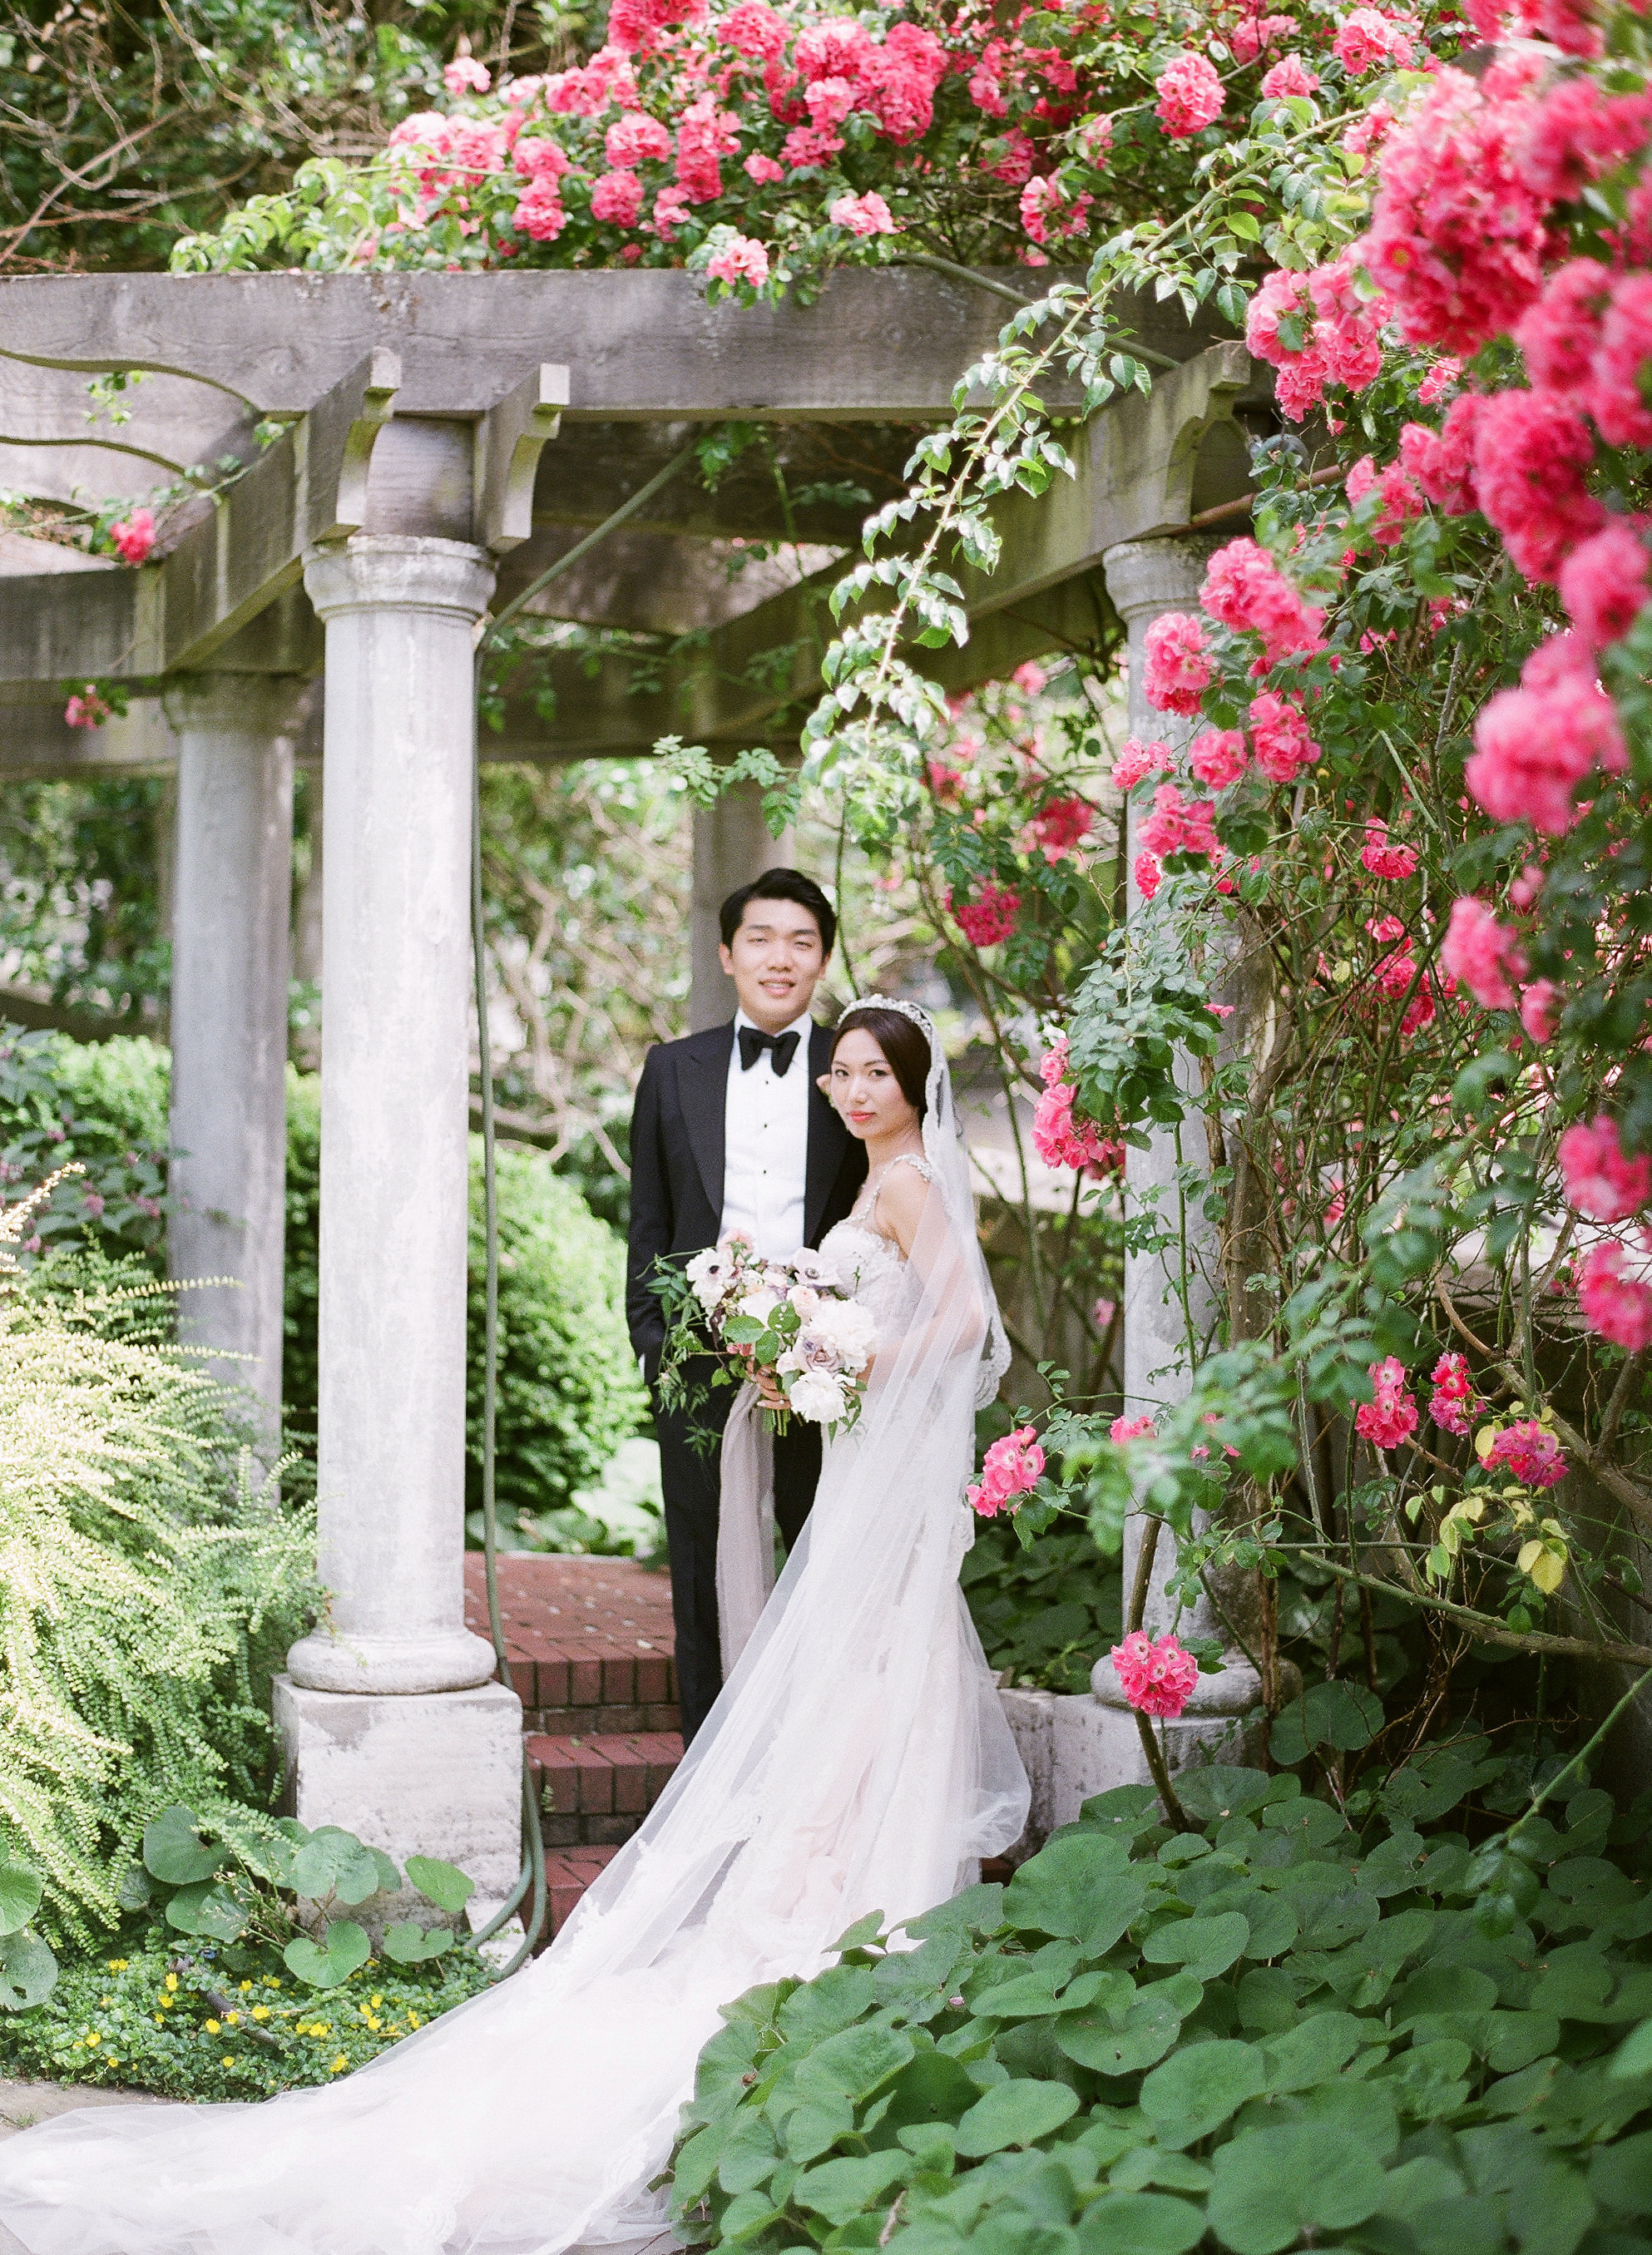 gloria zee wedding couple pergola pink flowers